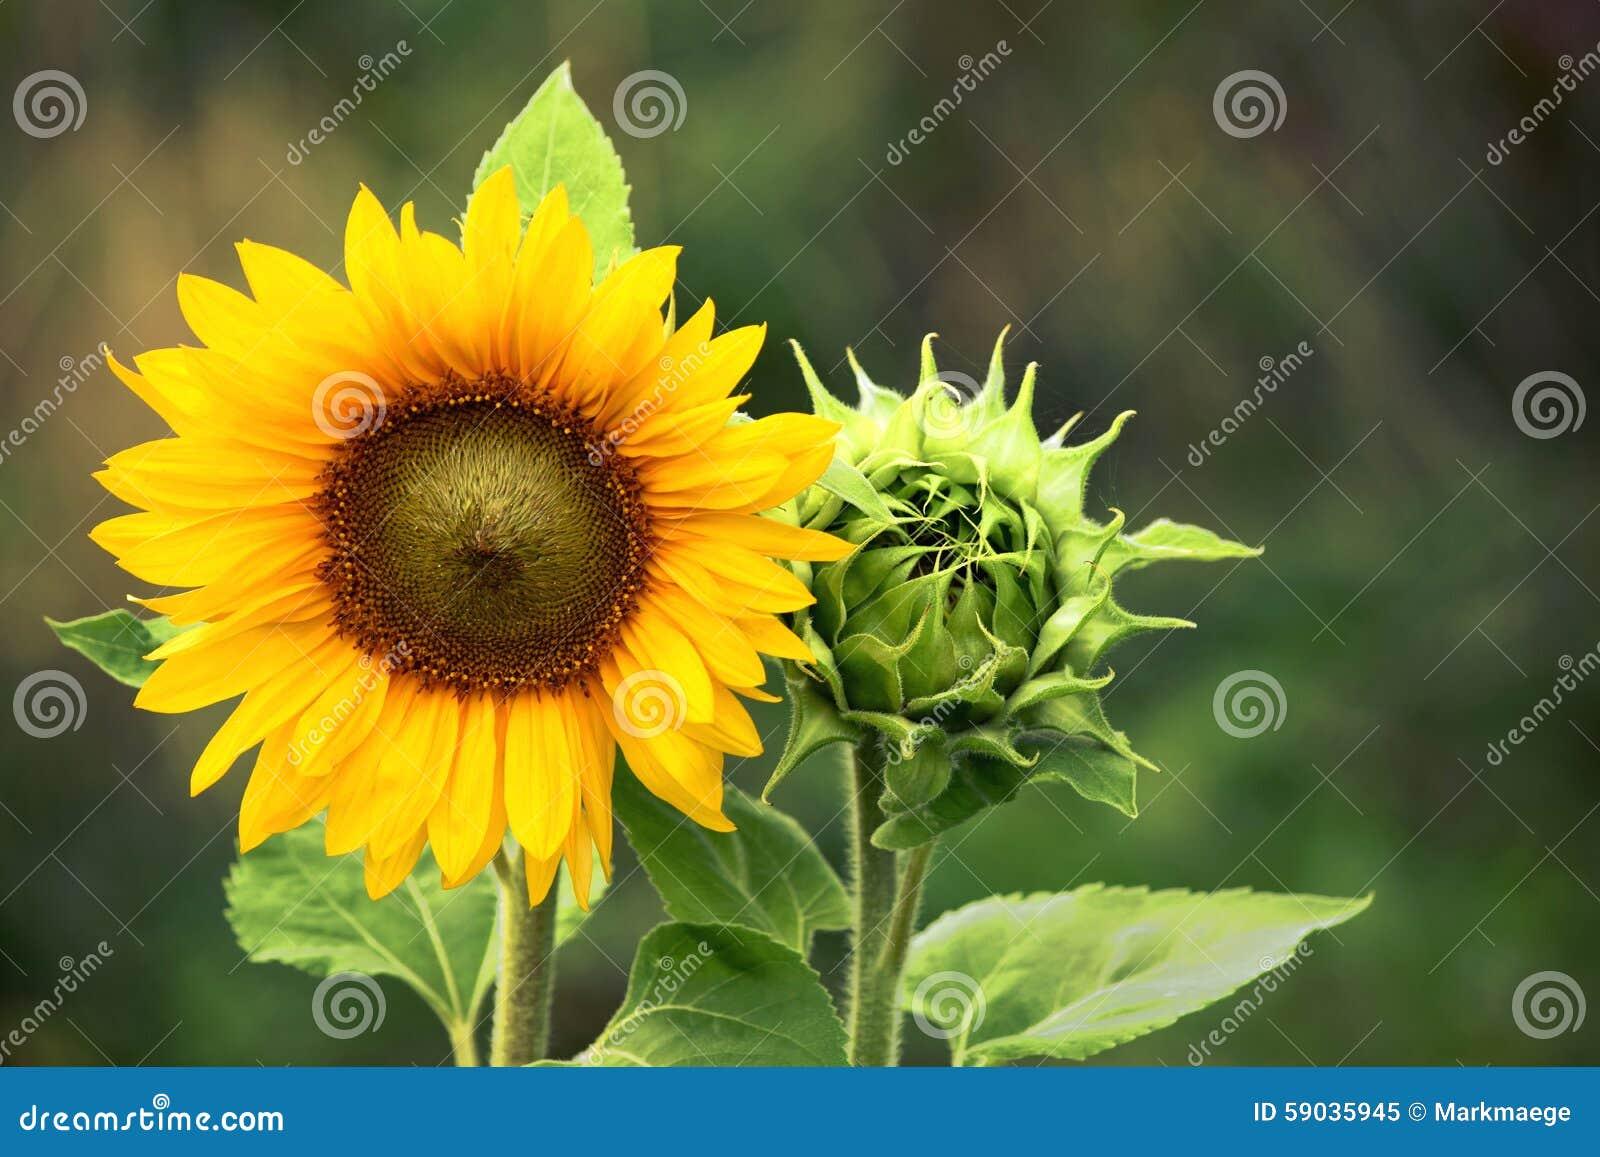 Tournesol avec la fleur verte de tournesol